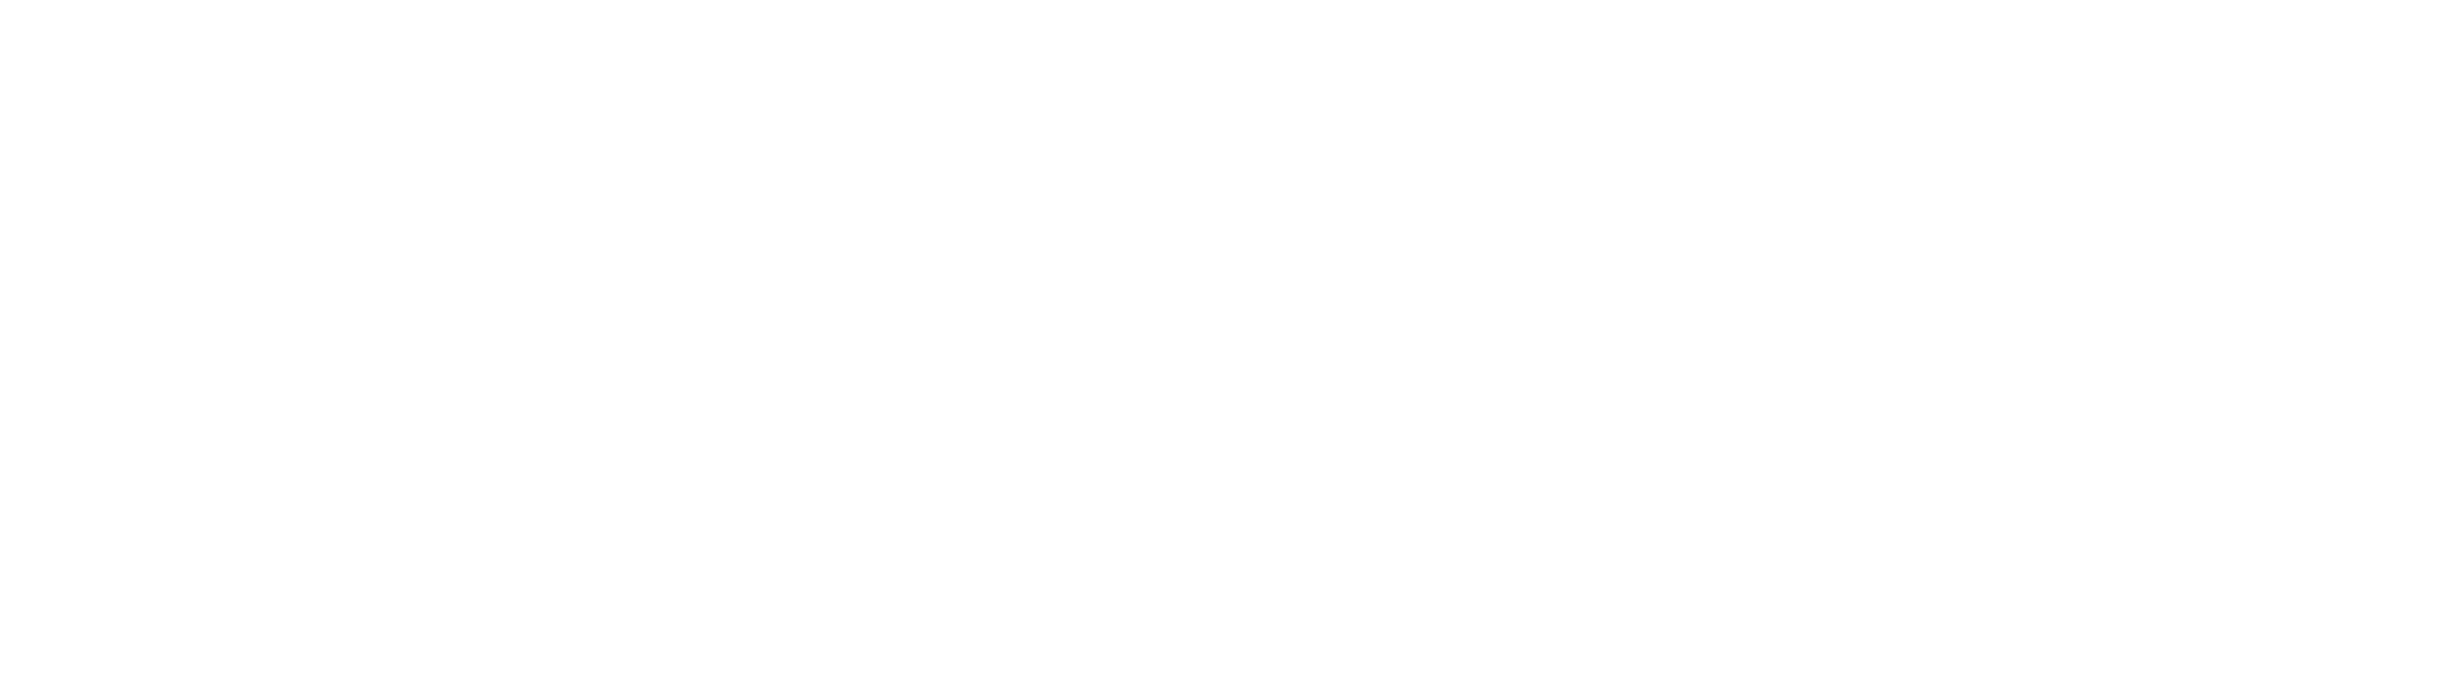 YMf_lgo1.png